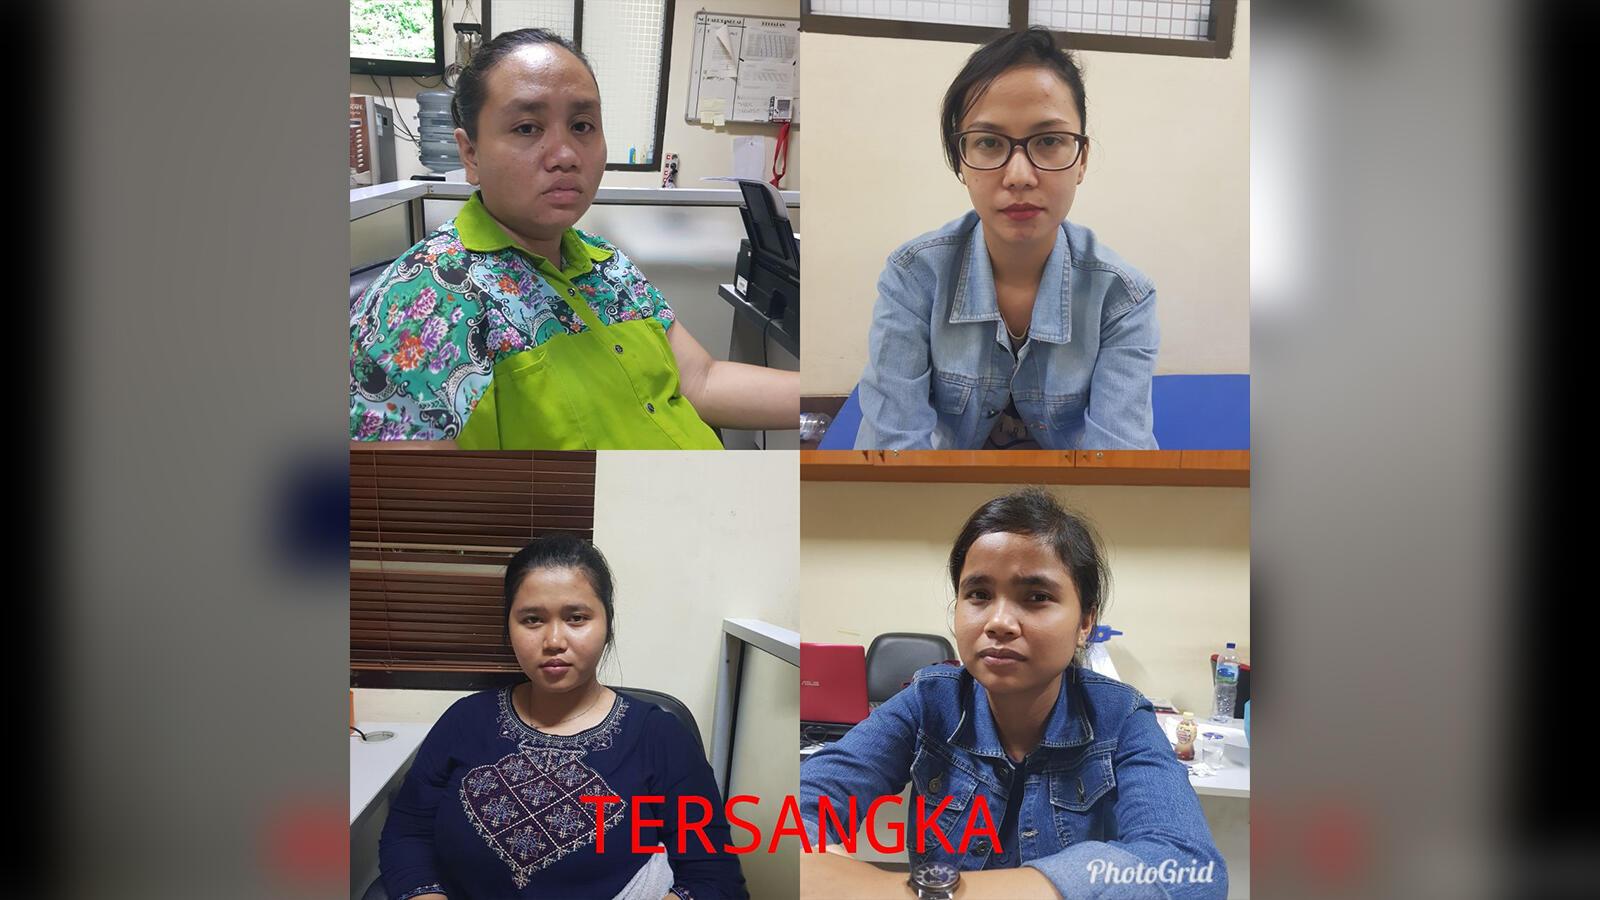 Polisi Ciduk 4 Wanita yang Jadi Agen Judi Online di Kepulauan Riau